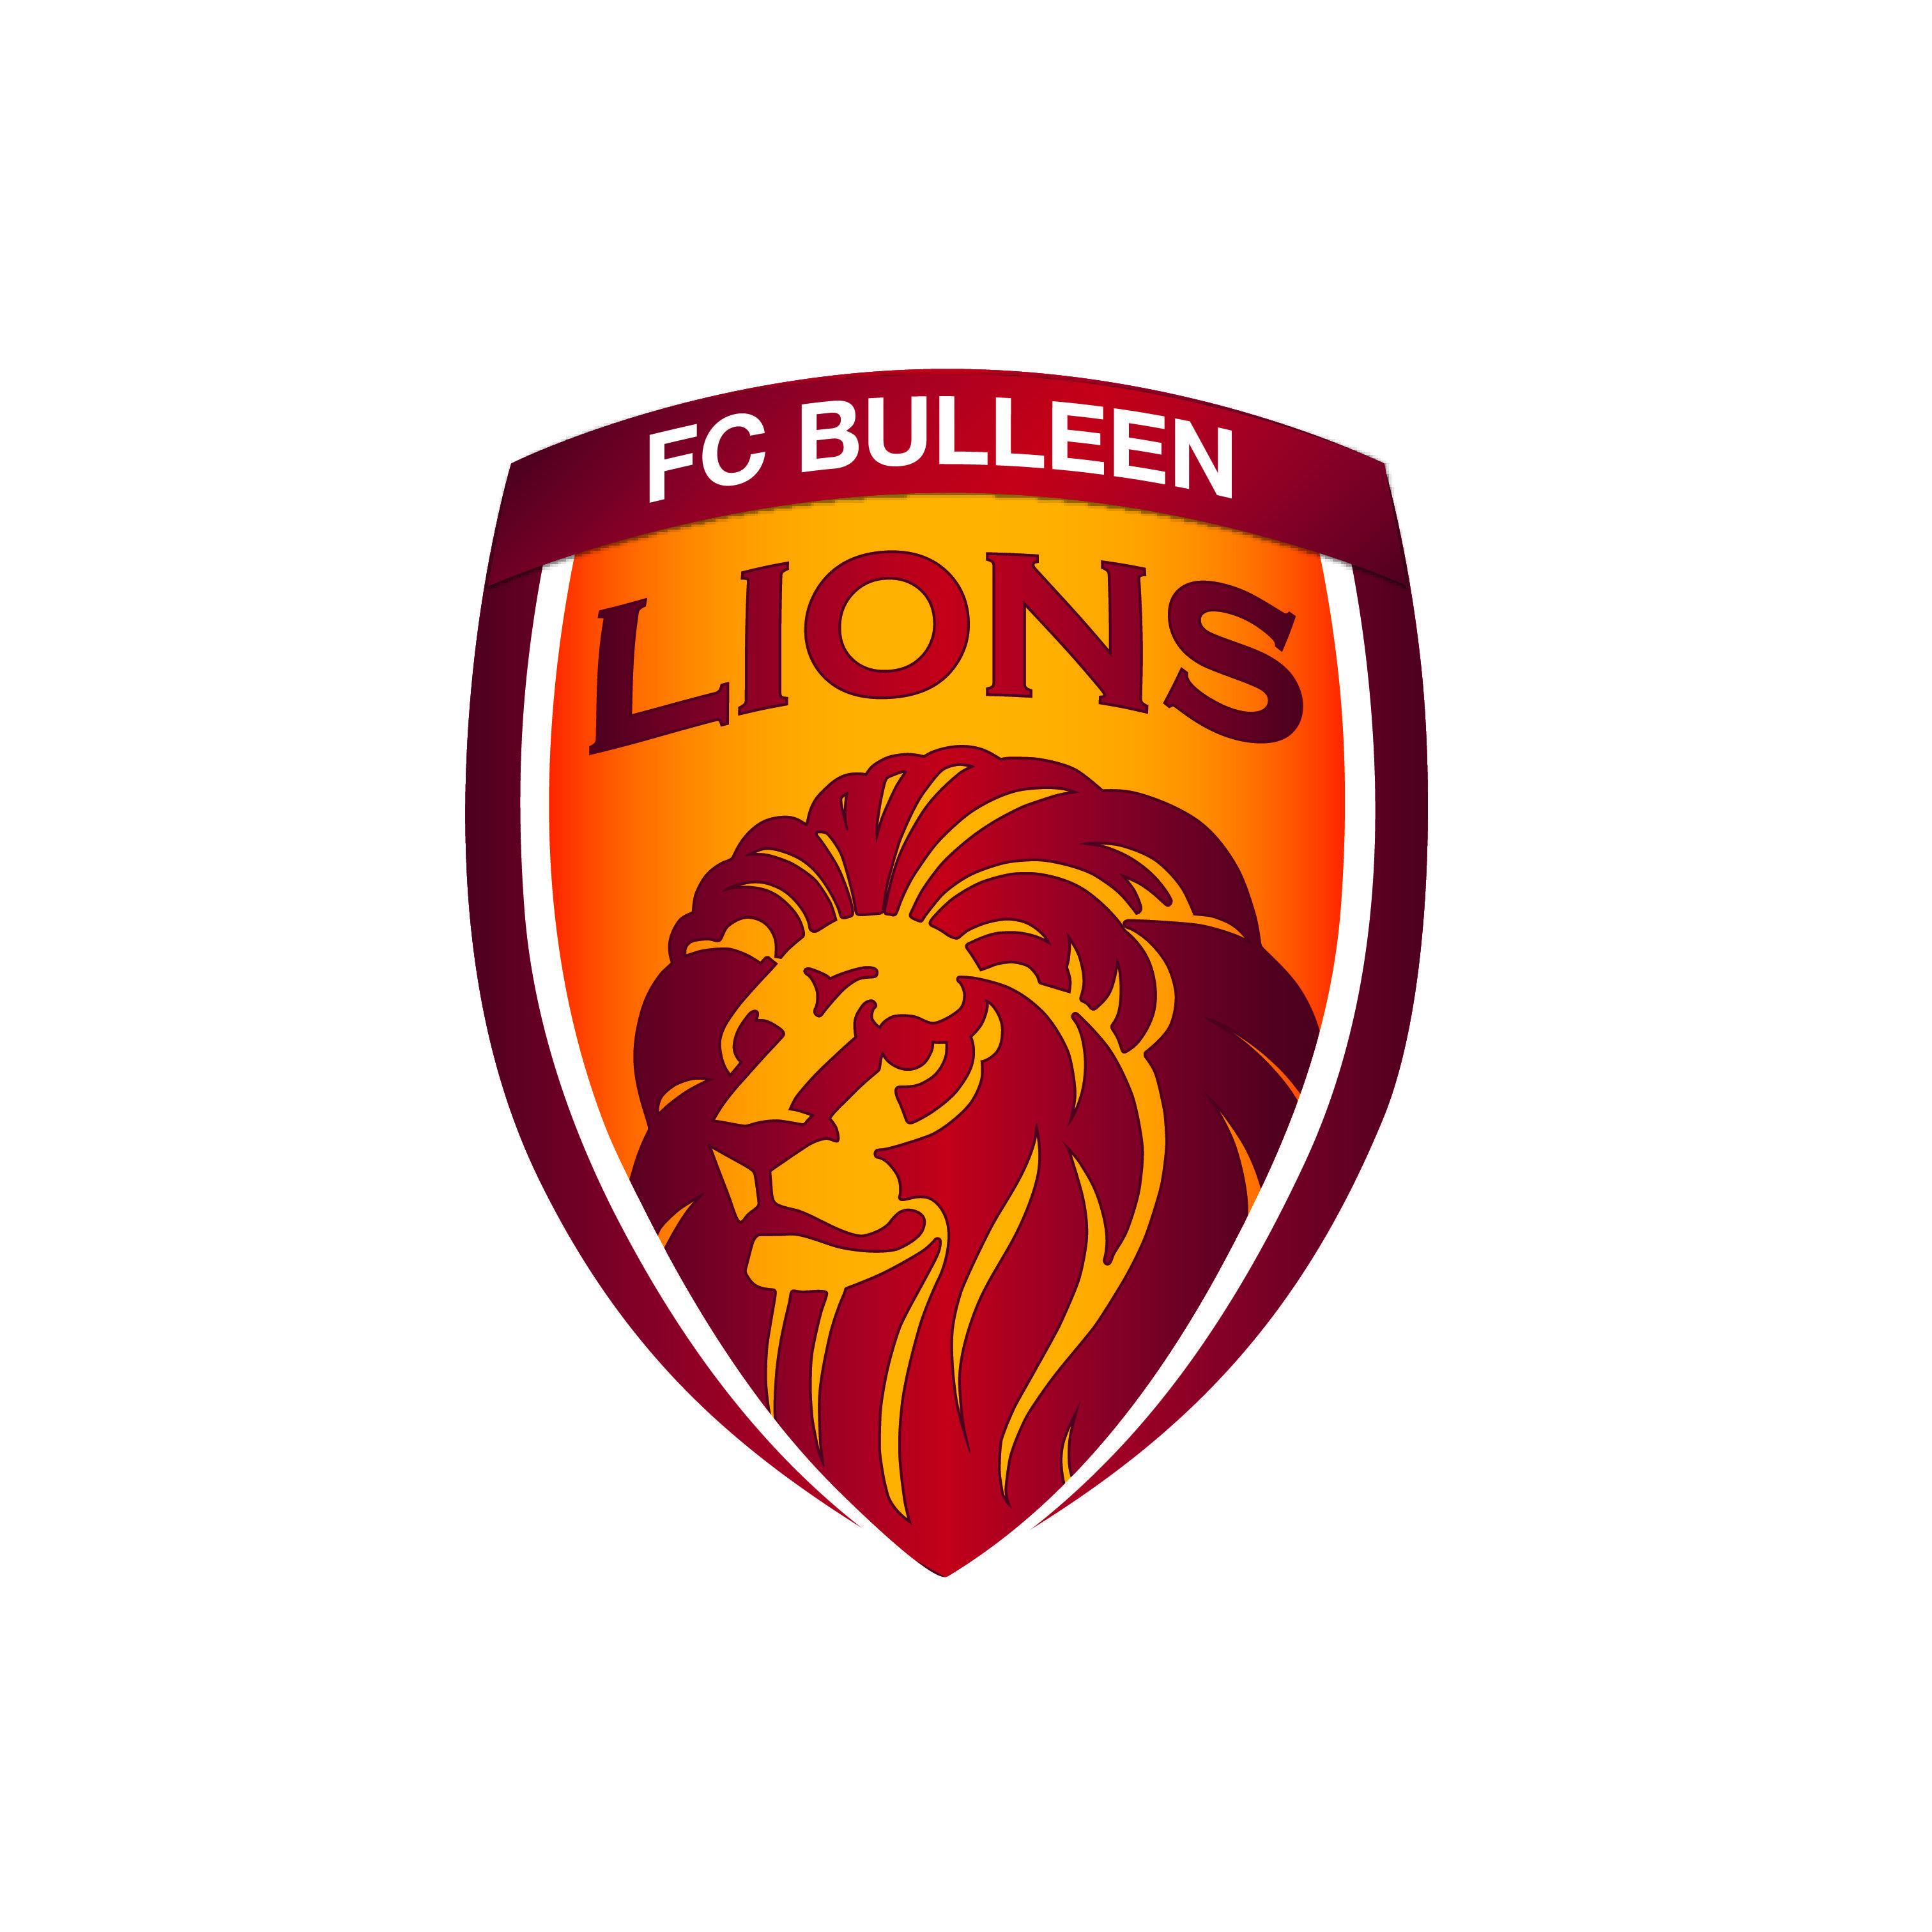 FC Bulleen Lions Football club soccer logo design by